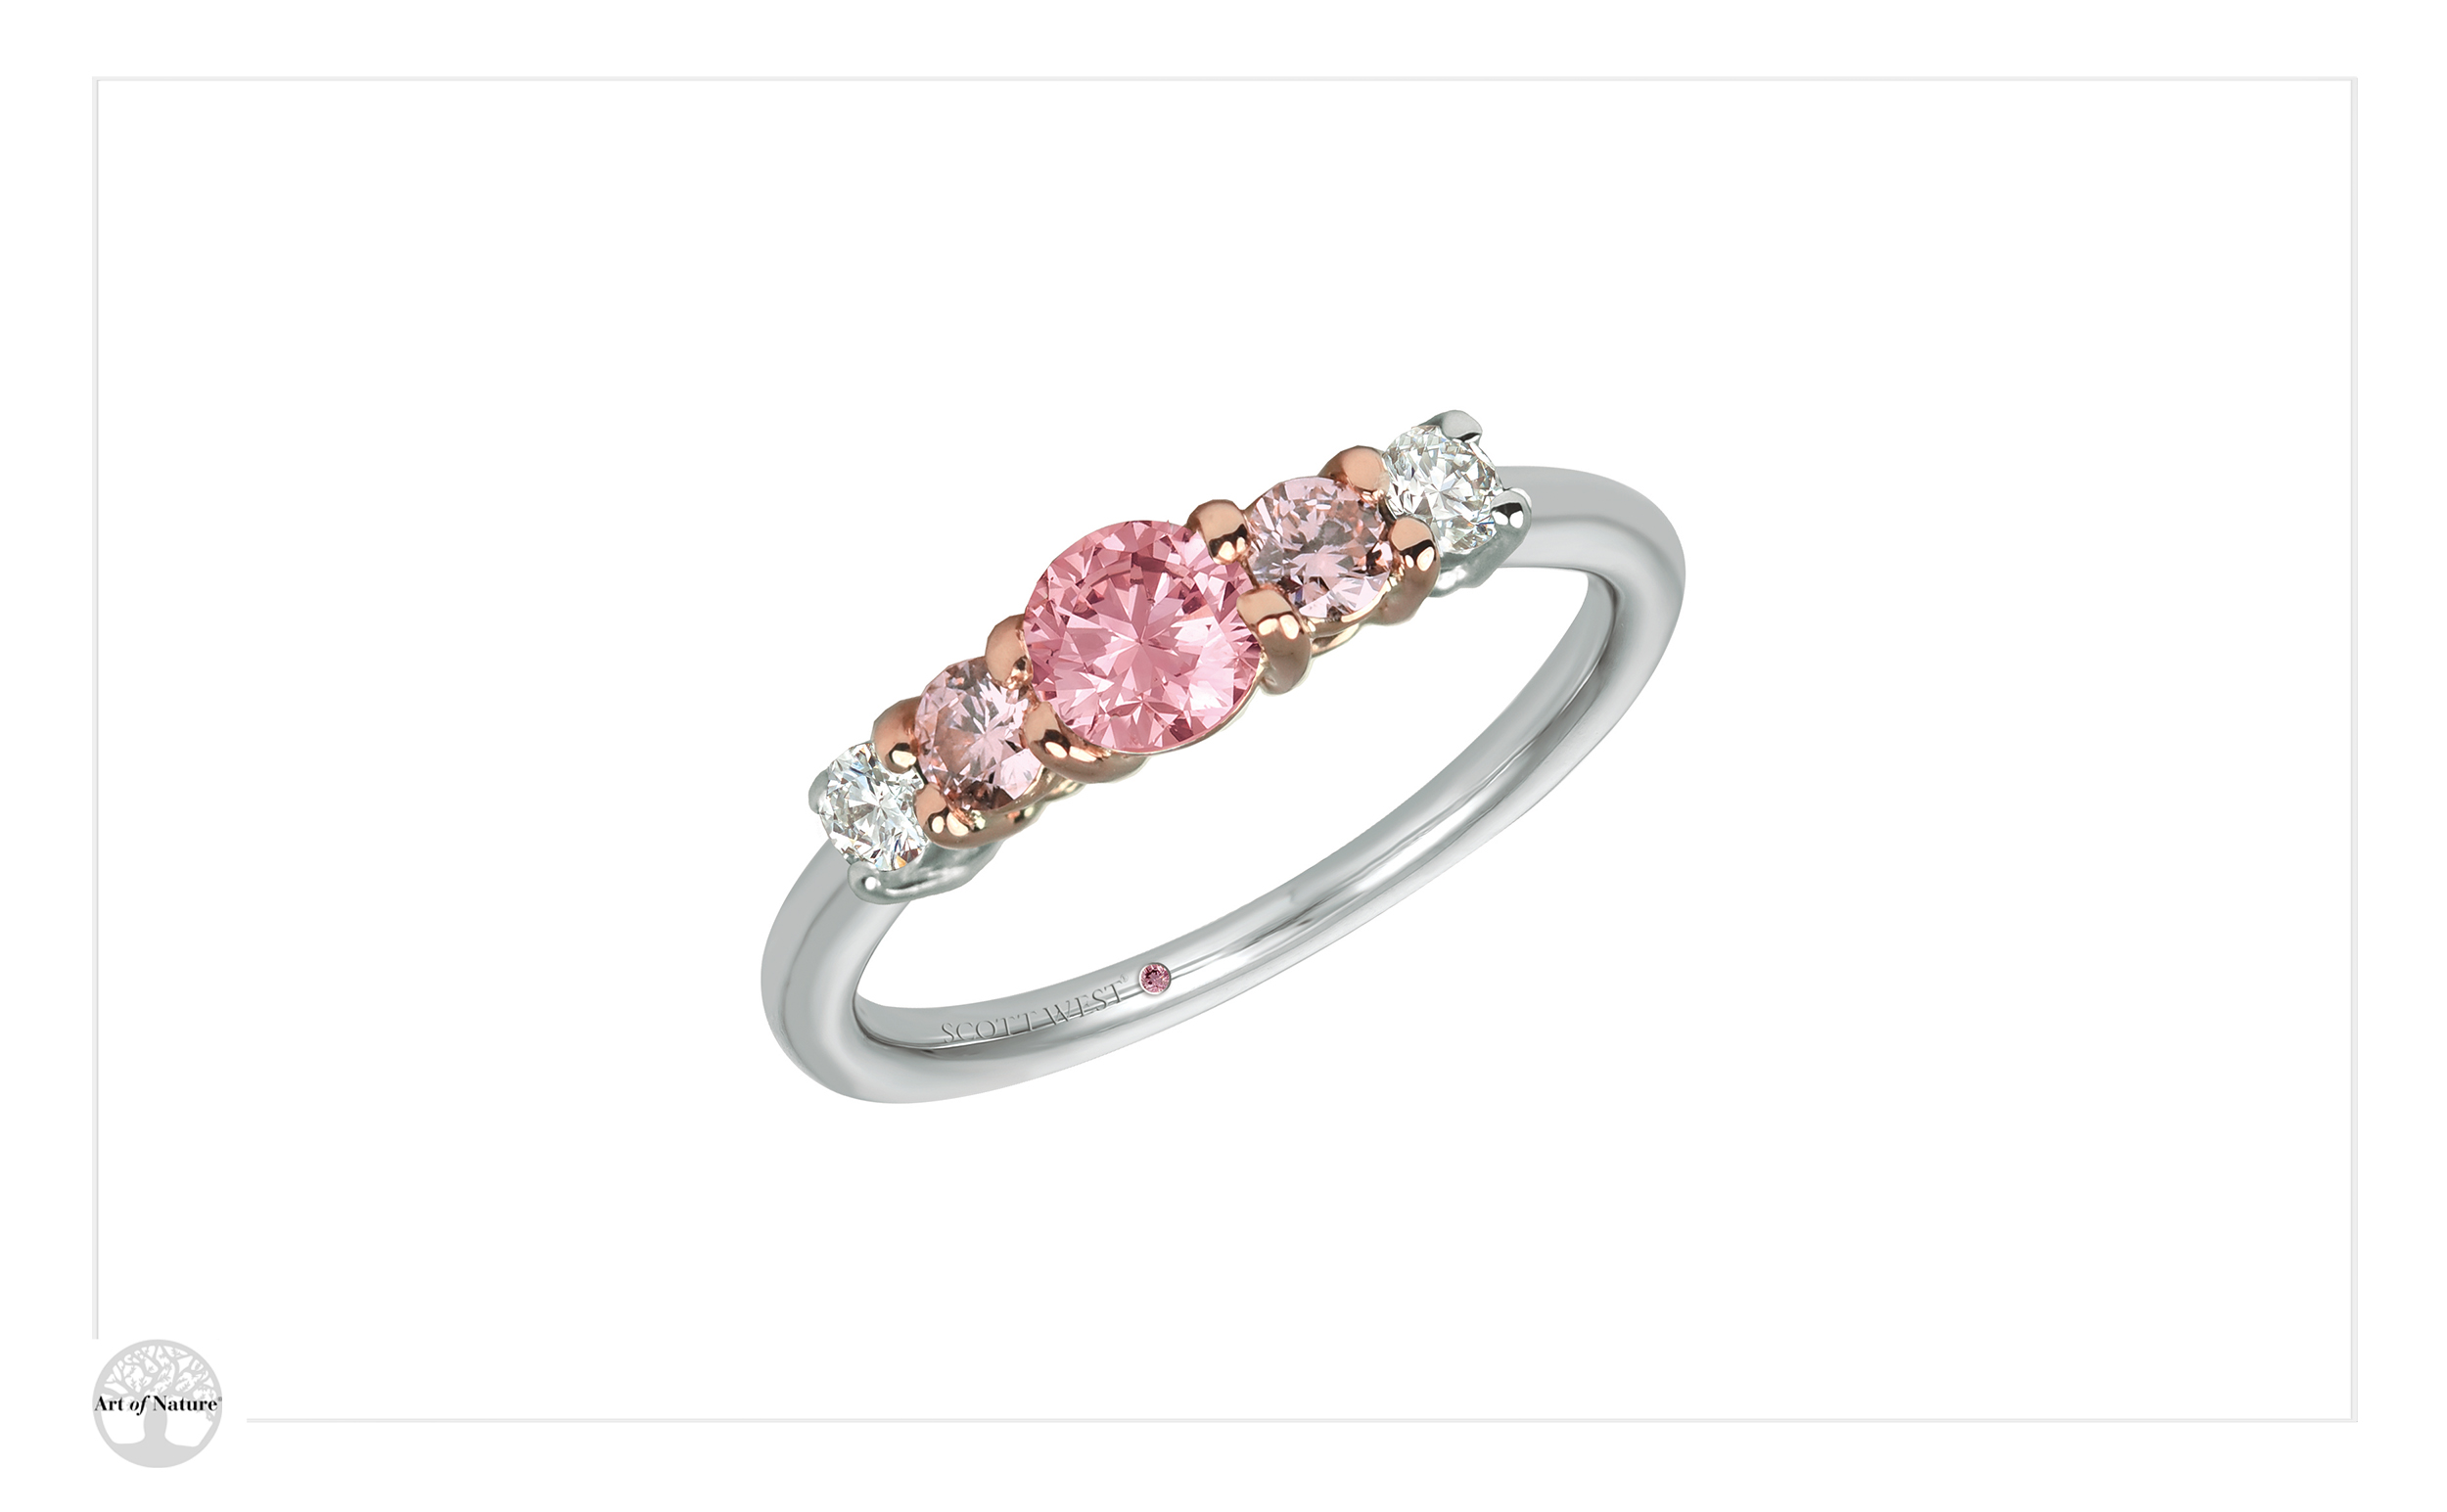 Scott West - Bridal three stone pink ring